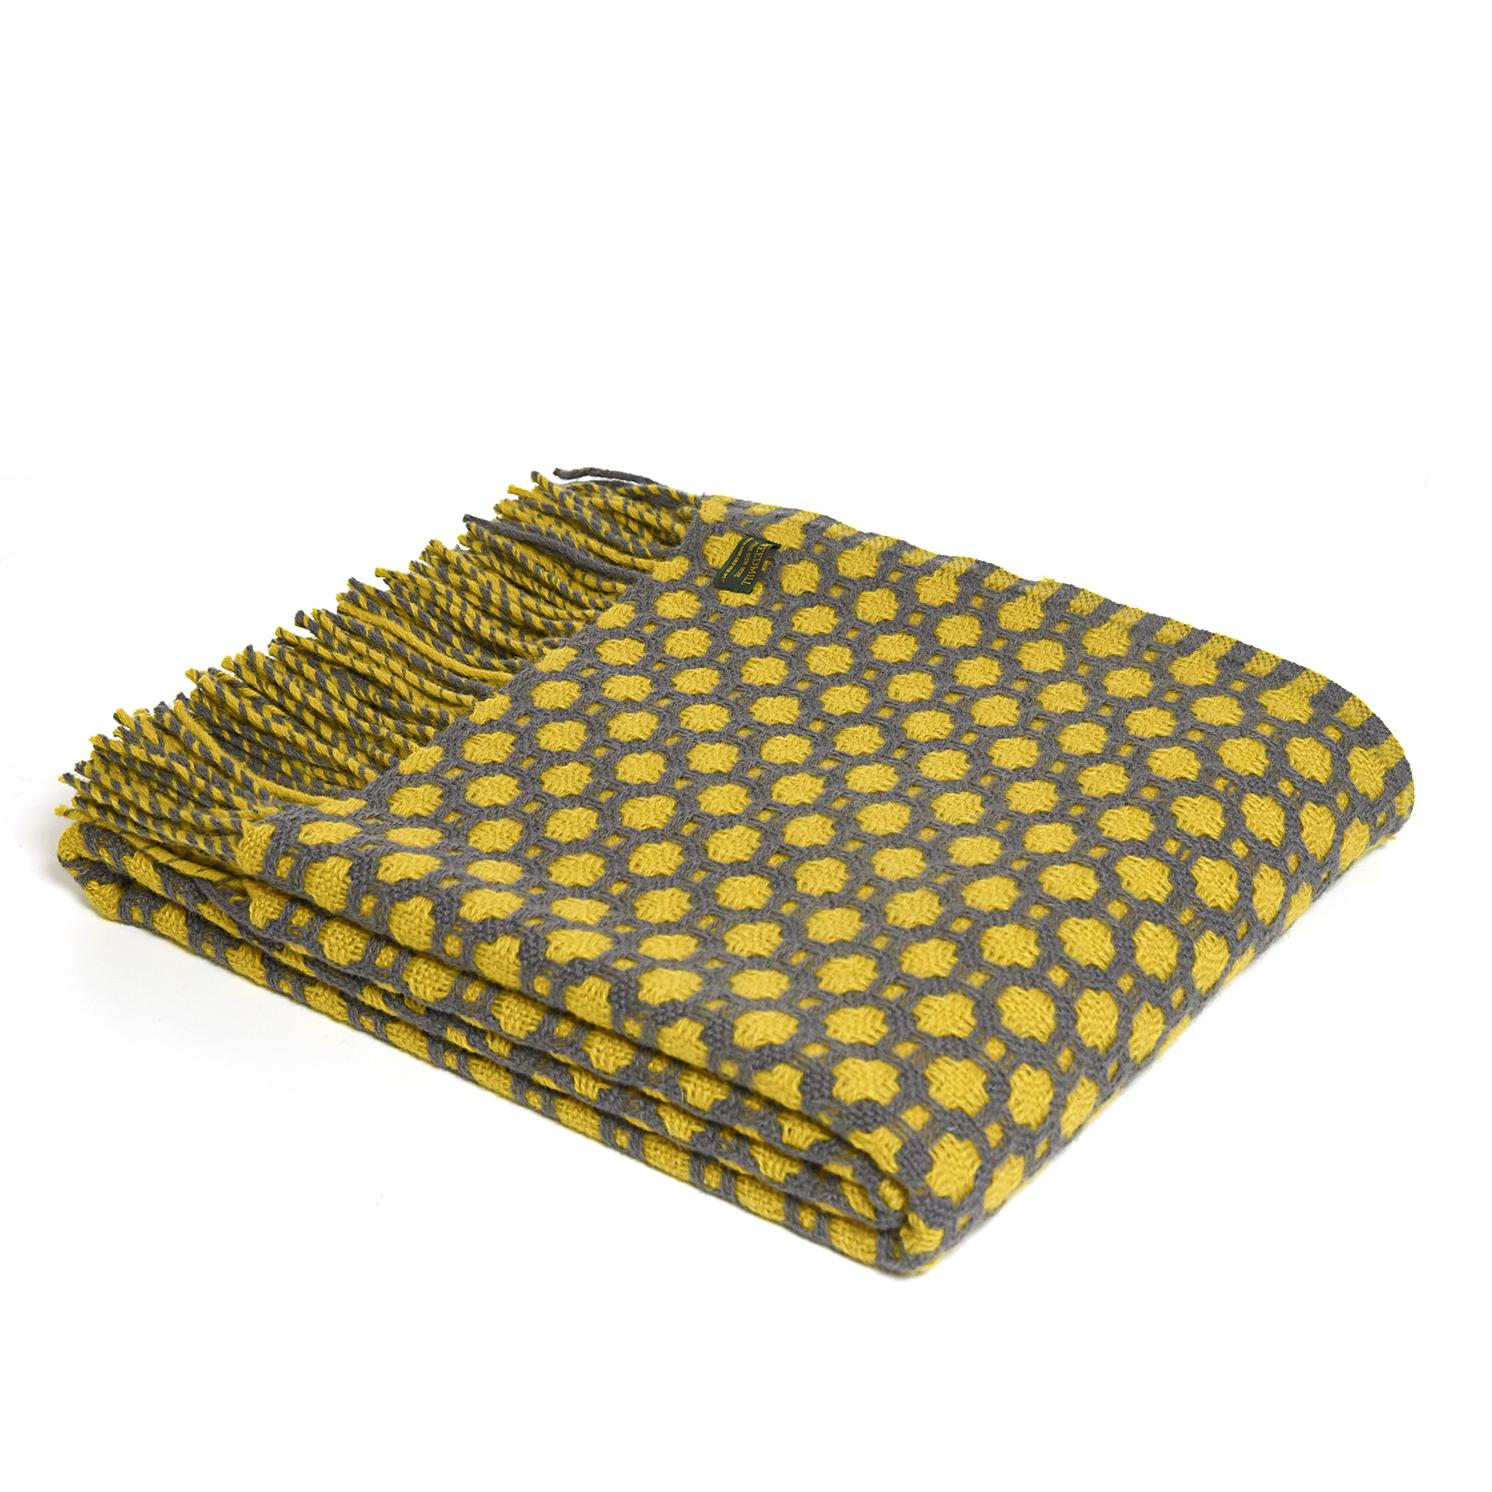 Tweedmill – Solid Grey & Yellow Pure New Wool Crossroads Throw